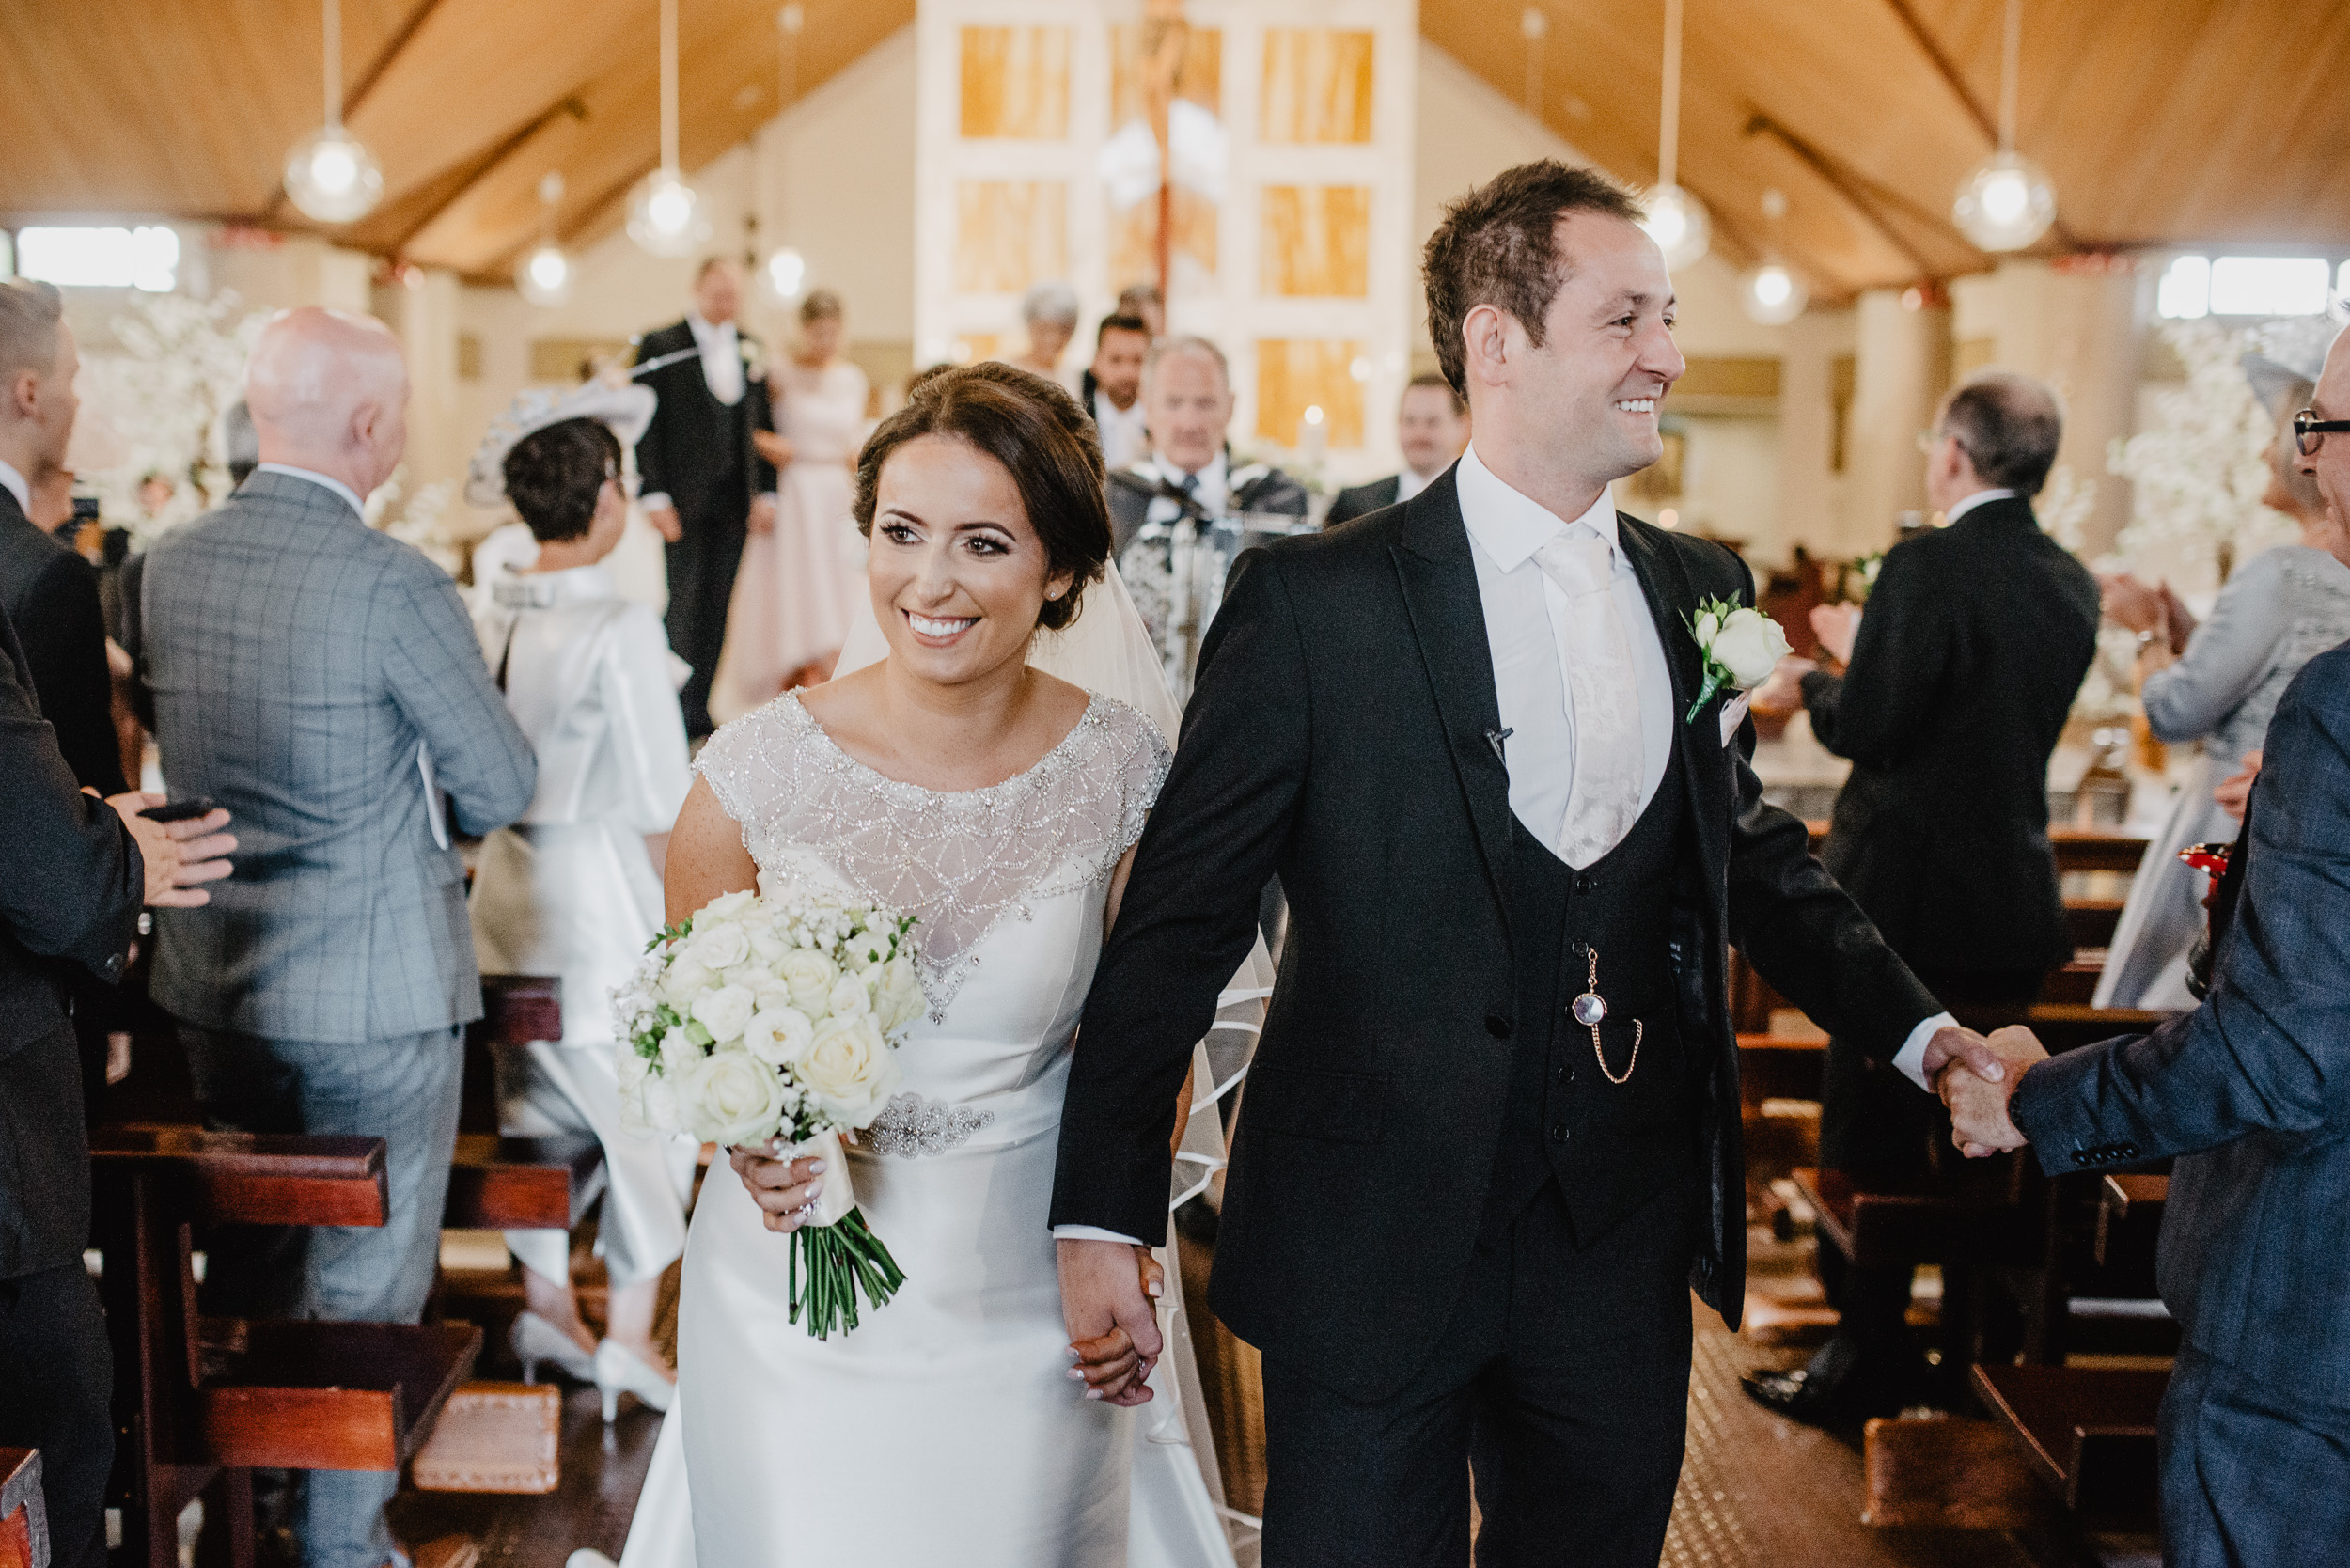 wedding photogaphy peter mackey 2018 claire-5.jpg